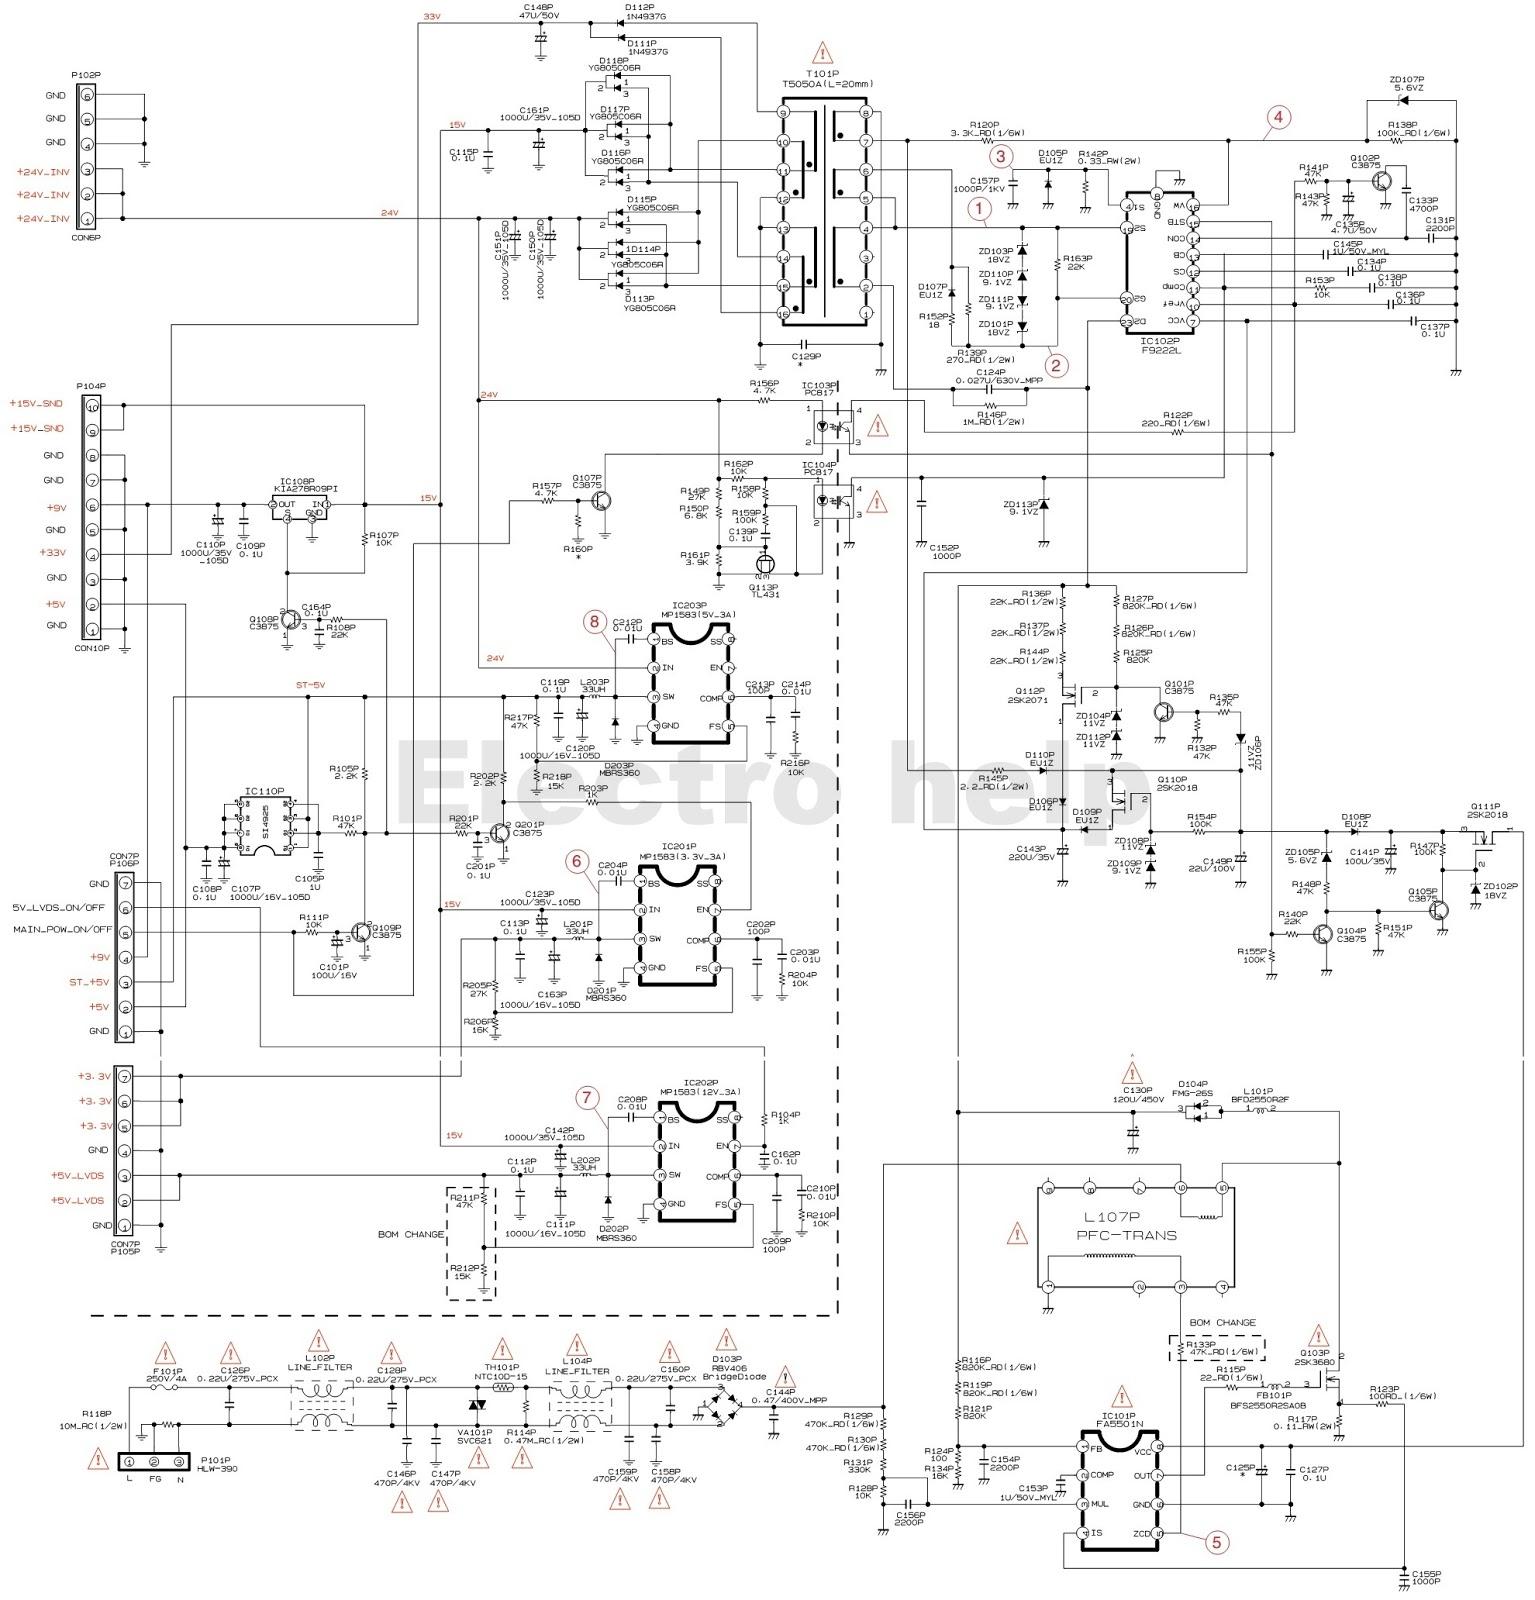 john deere 133 wiring diagram wiring diagramjohn deere 245 wiring diagram  wiring schematic diagram 94john deere